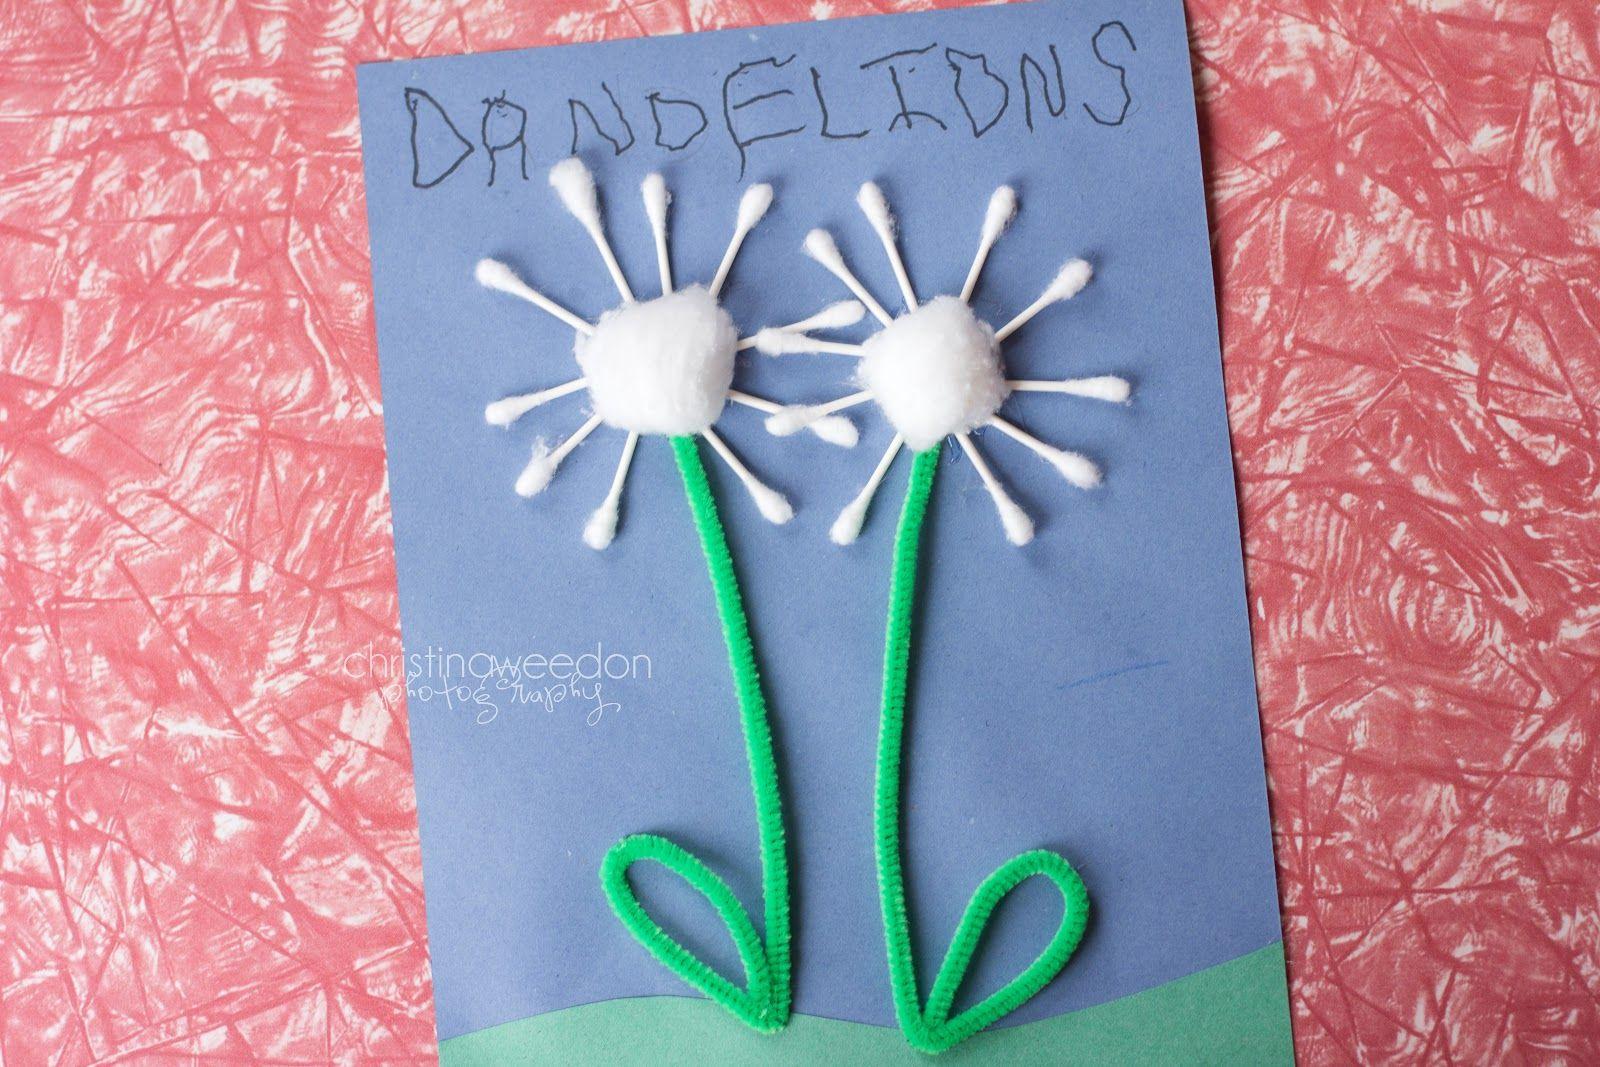 Dandelions On The Wall Homeschool The Letter D Crafts Preschool Toddler Activities